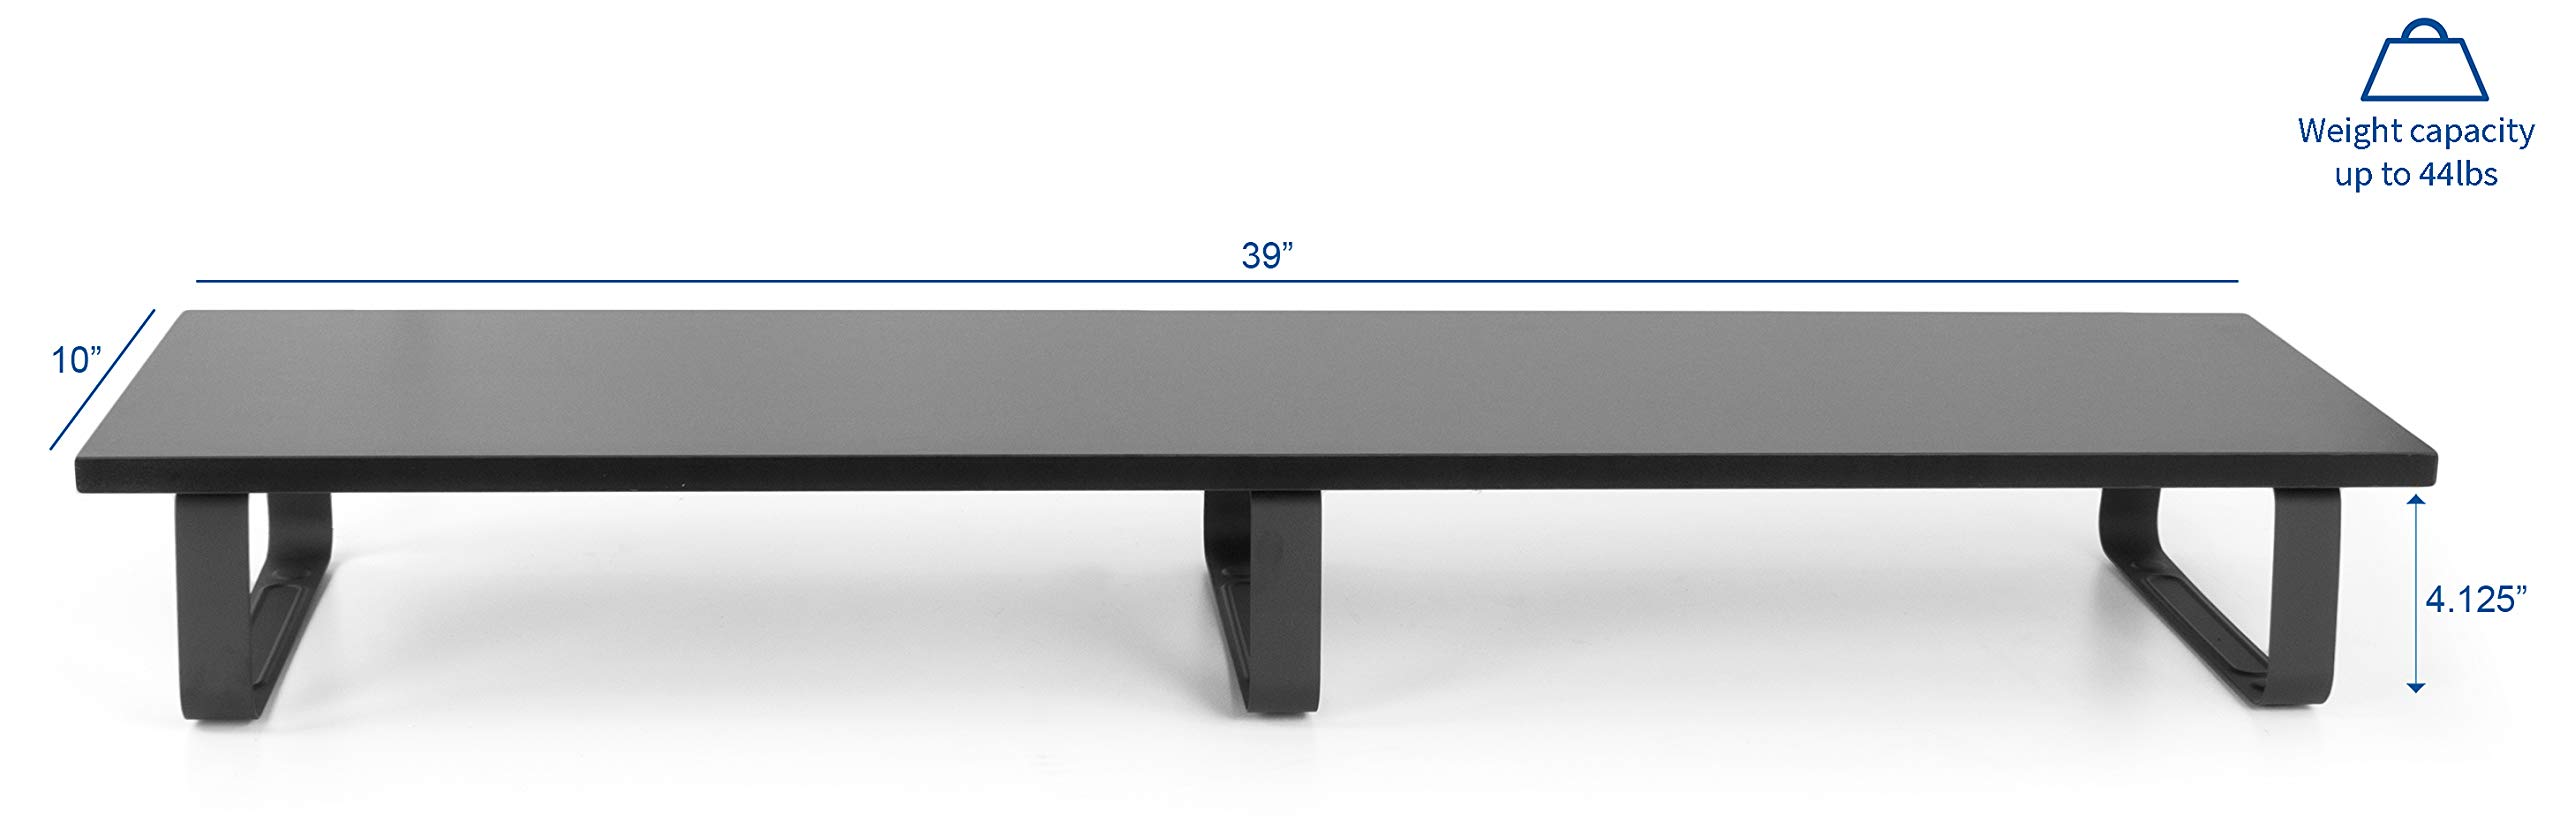 VIVO Black Wood 39'' Wide Extra Long Desktop Stand Ergonomic TV, Dual Monitor Riser and Desk Tabletop Organizer (STAND-V000DL) by VIVO (Image #2)